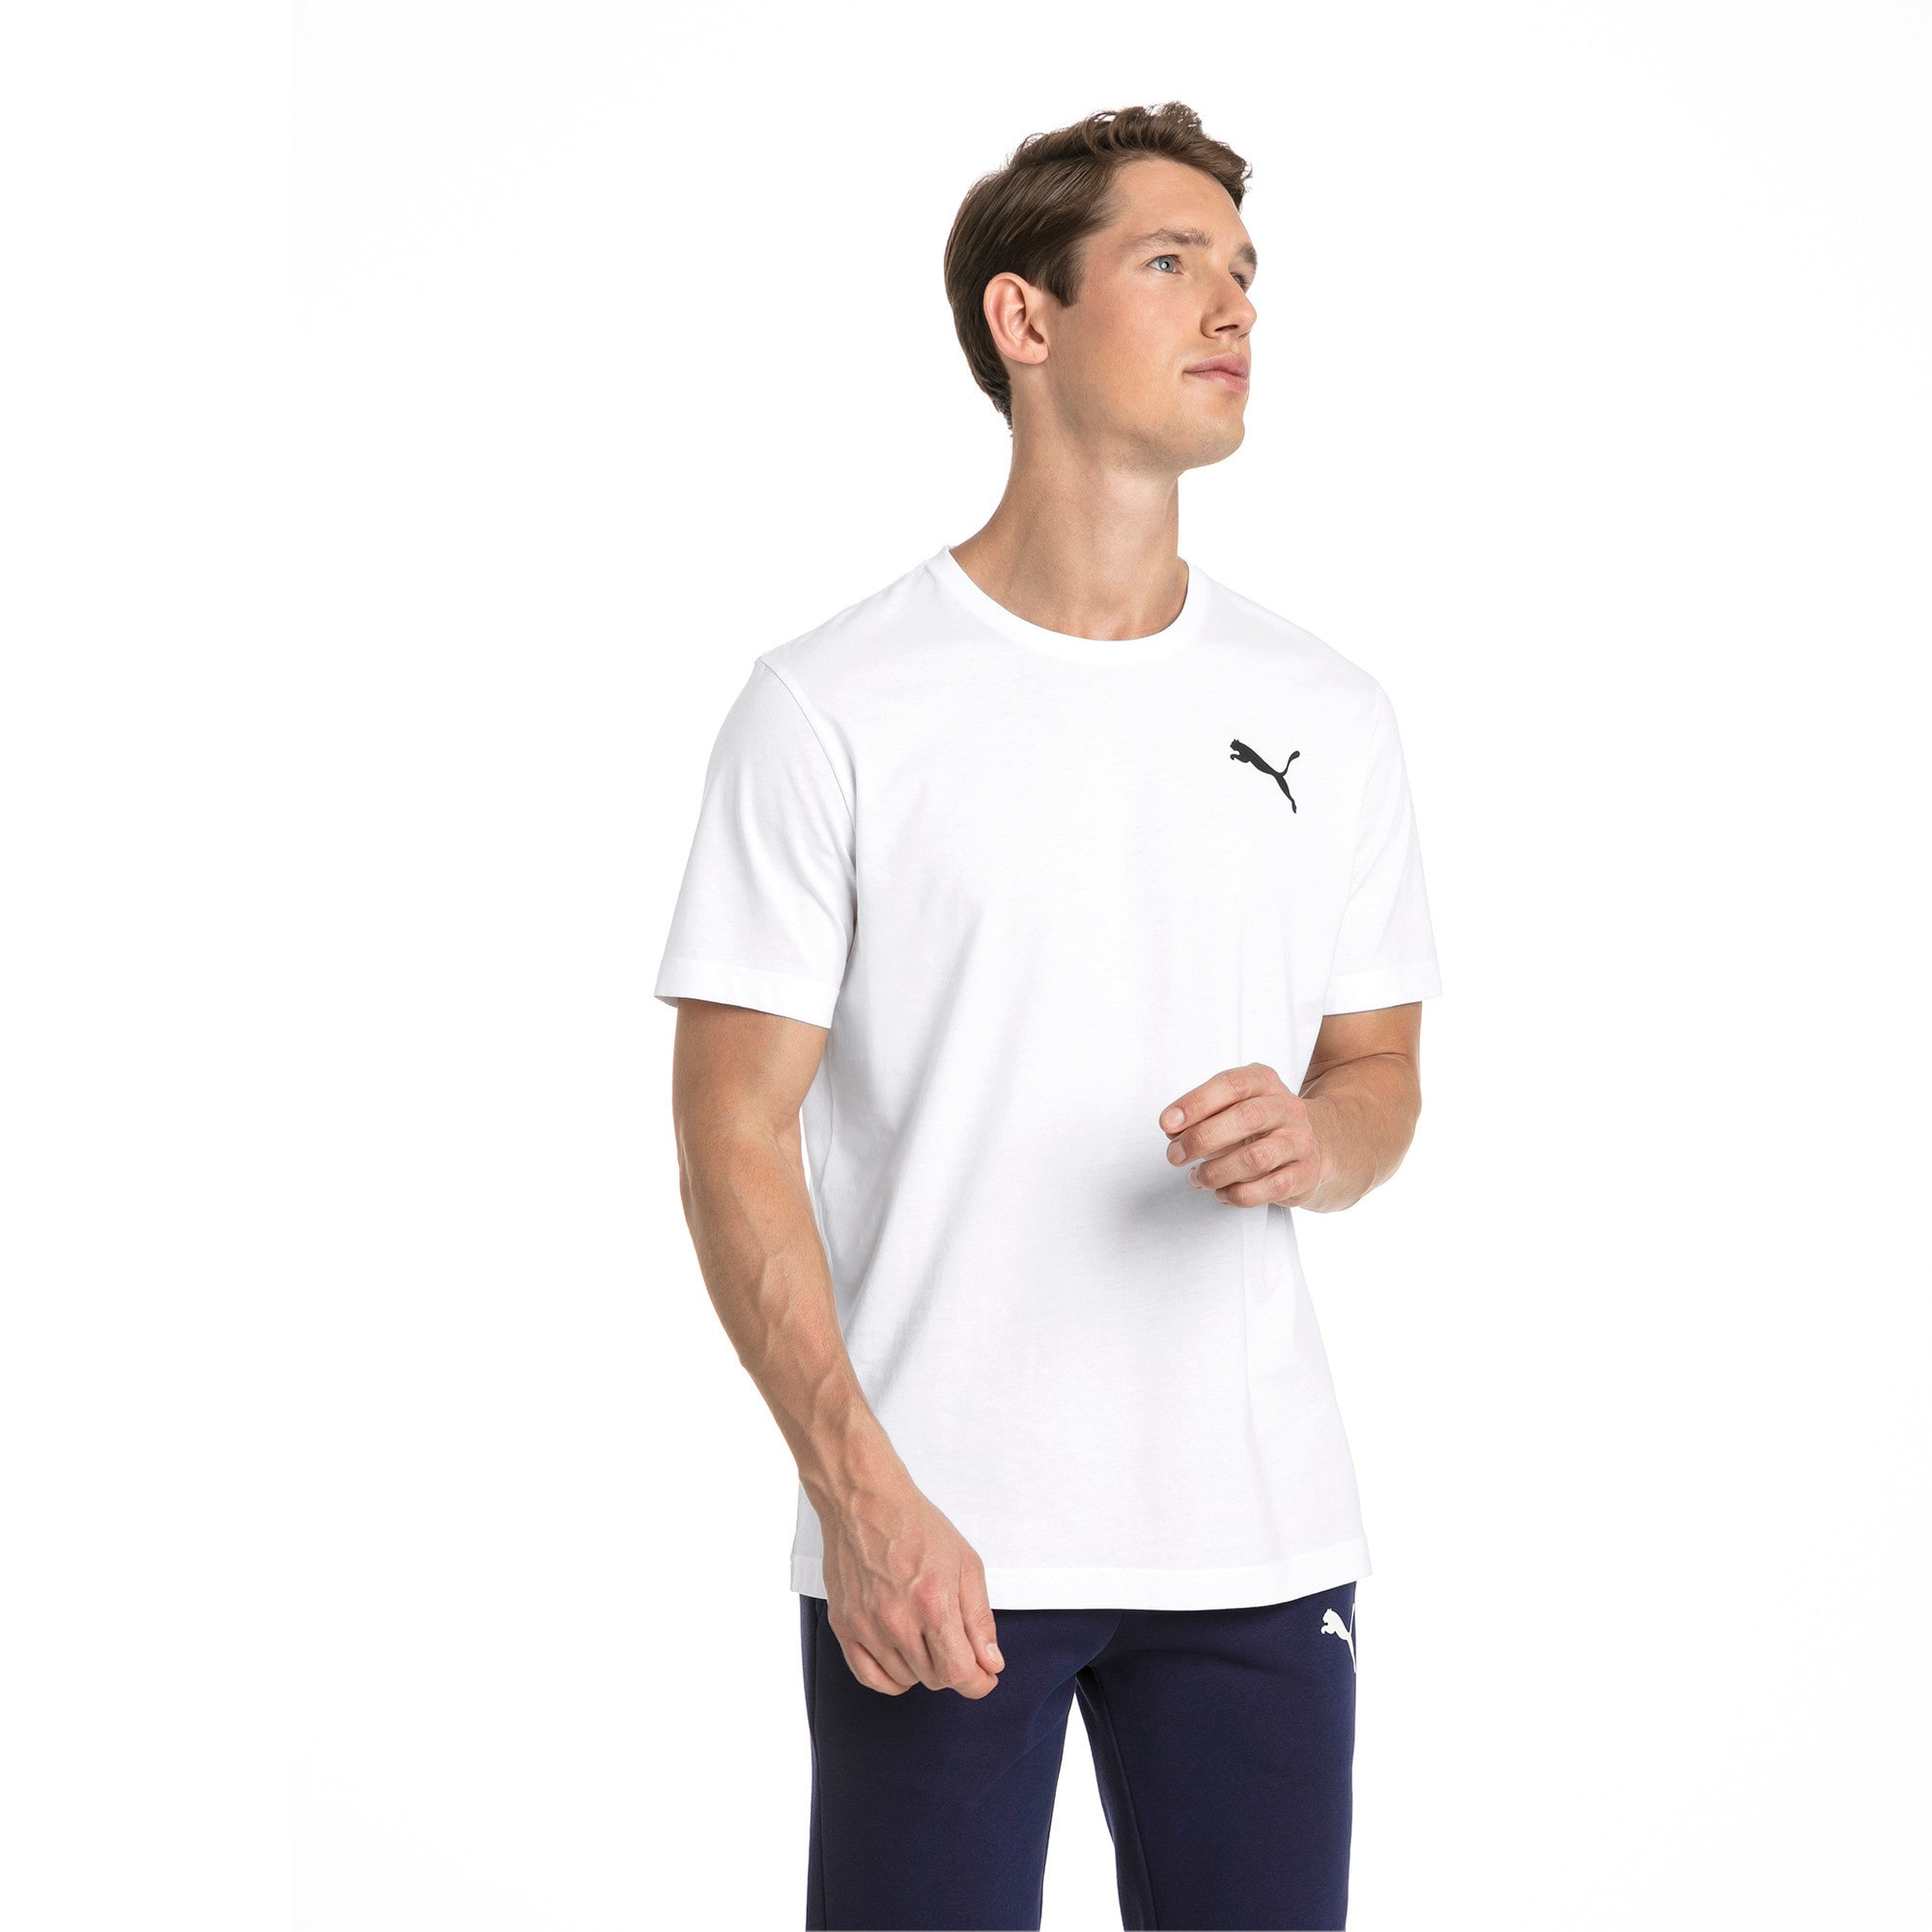 Thumbnail 1 of T-shirt con logo piccolo Essentials uomo, Puma White-_Cat, medium